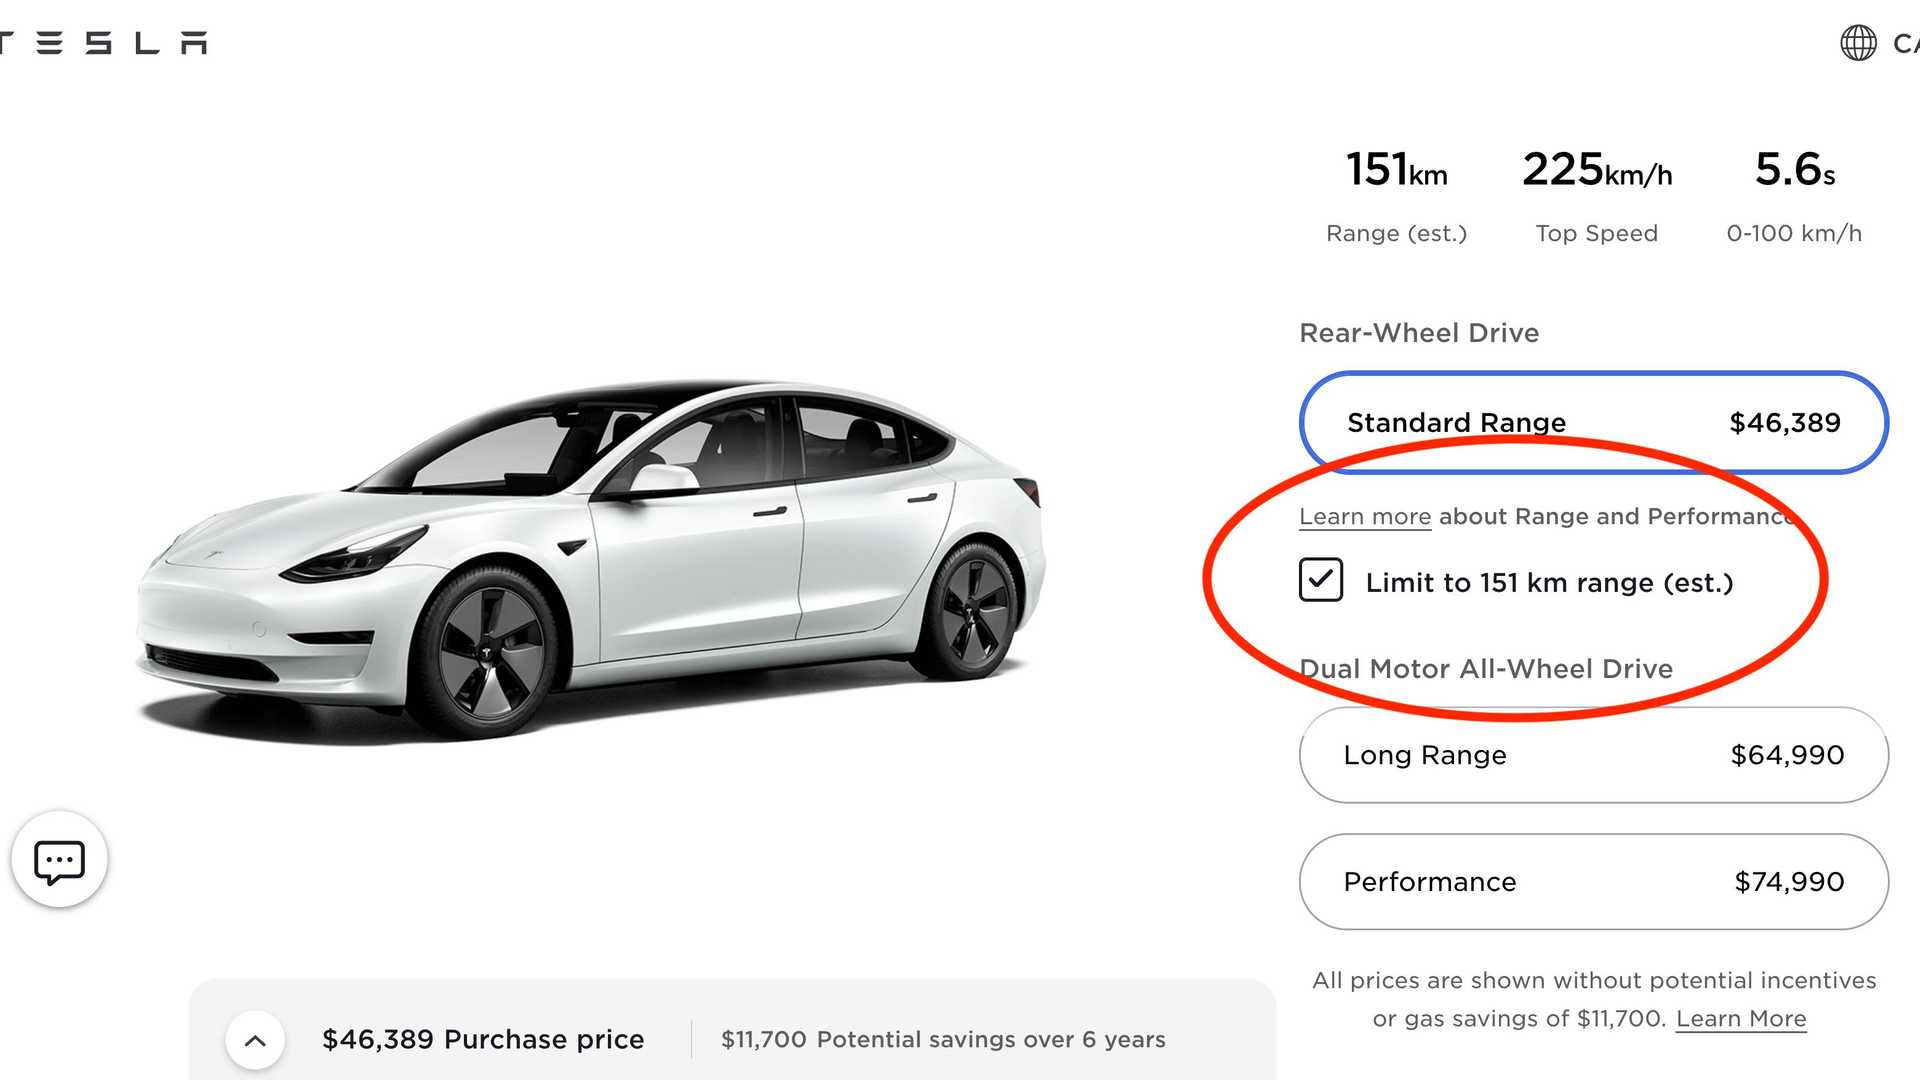 Canada's 94-Mile Range Tesla Model 3 Is Now Advertised